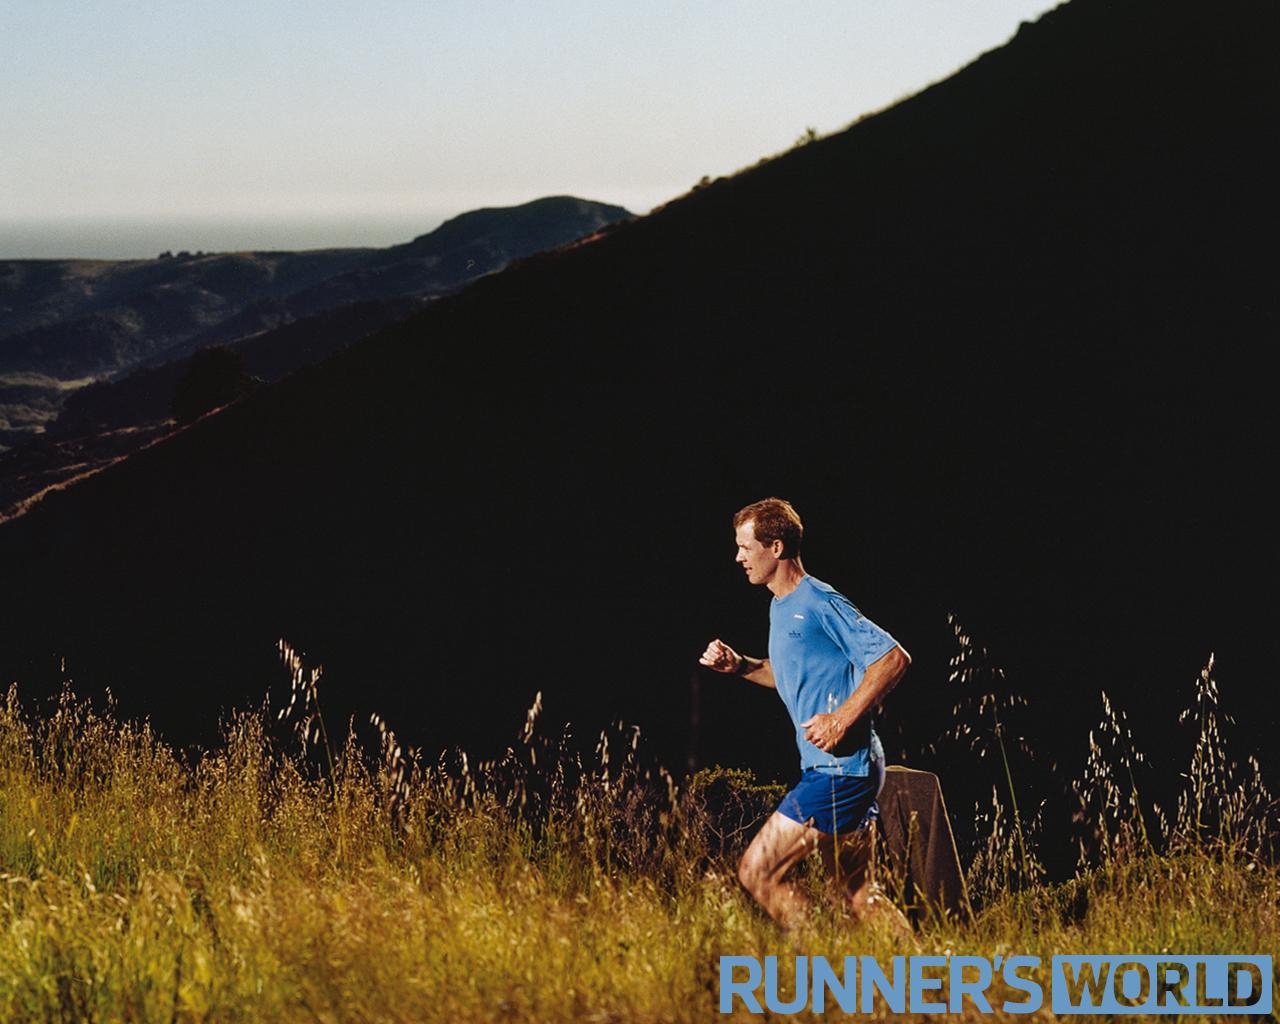 runners world wallpaper desktop wallpapersafari